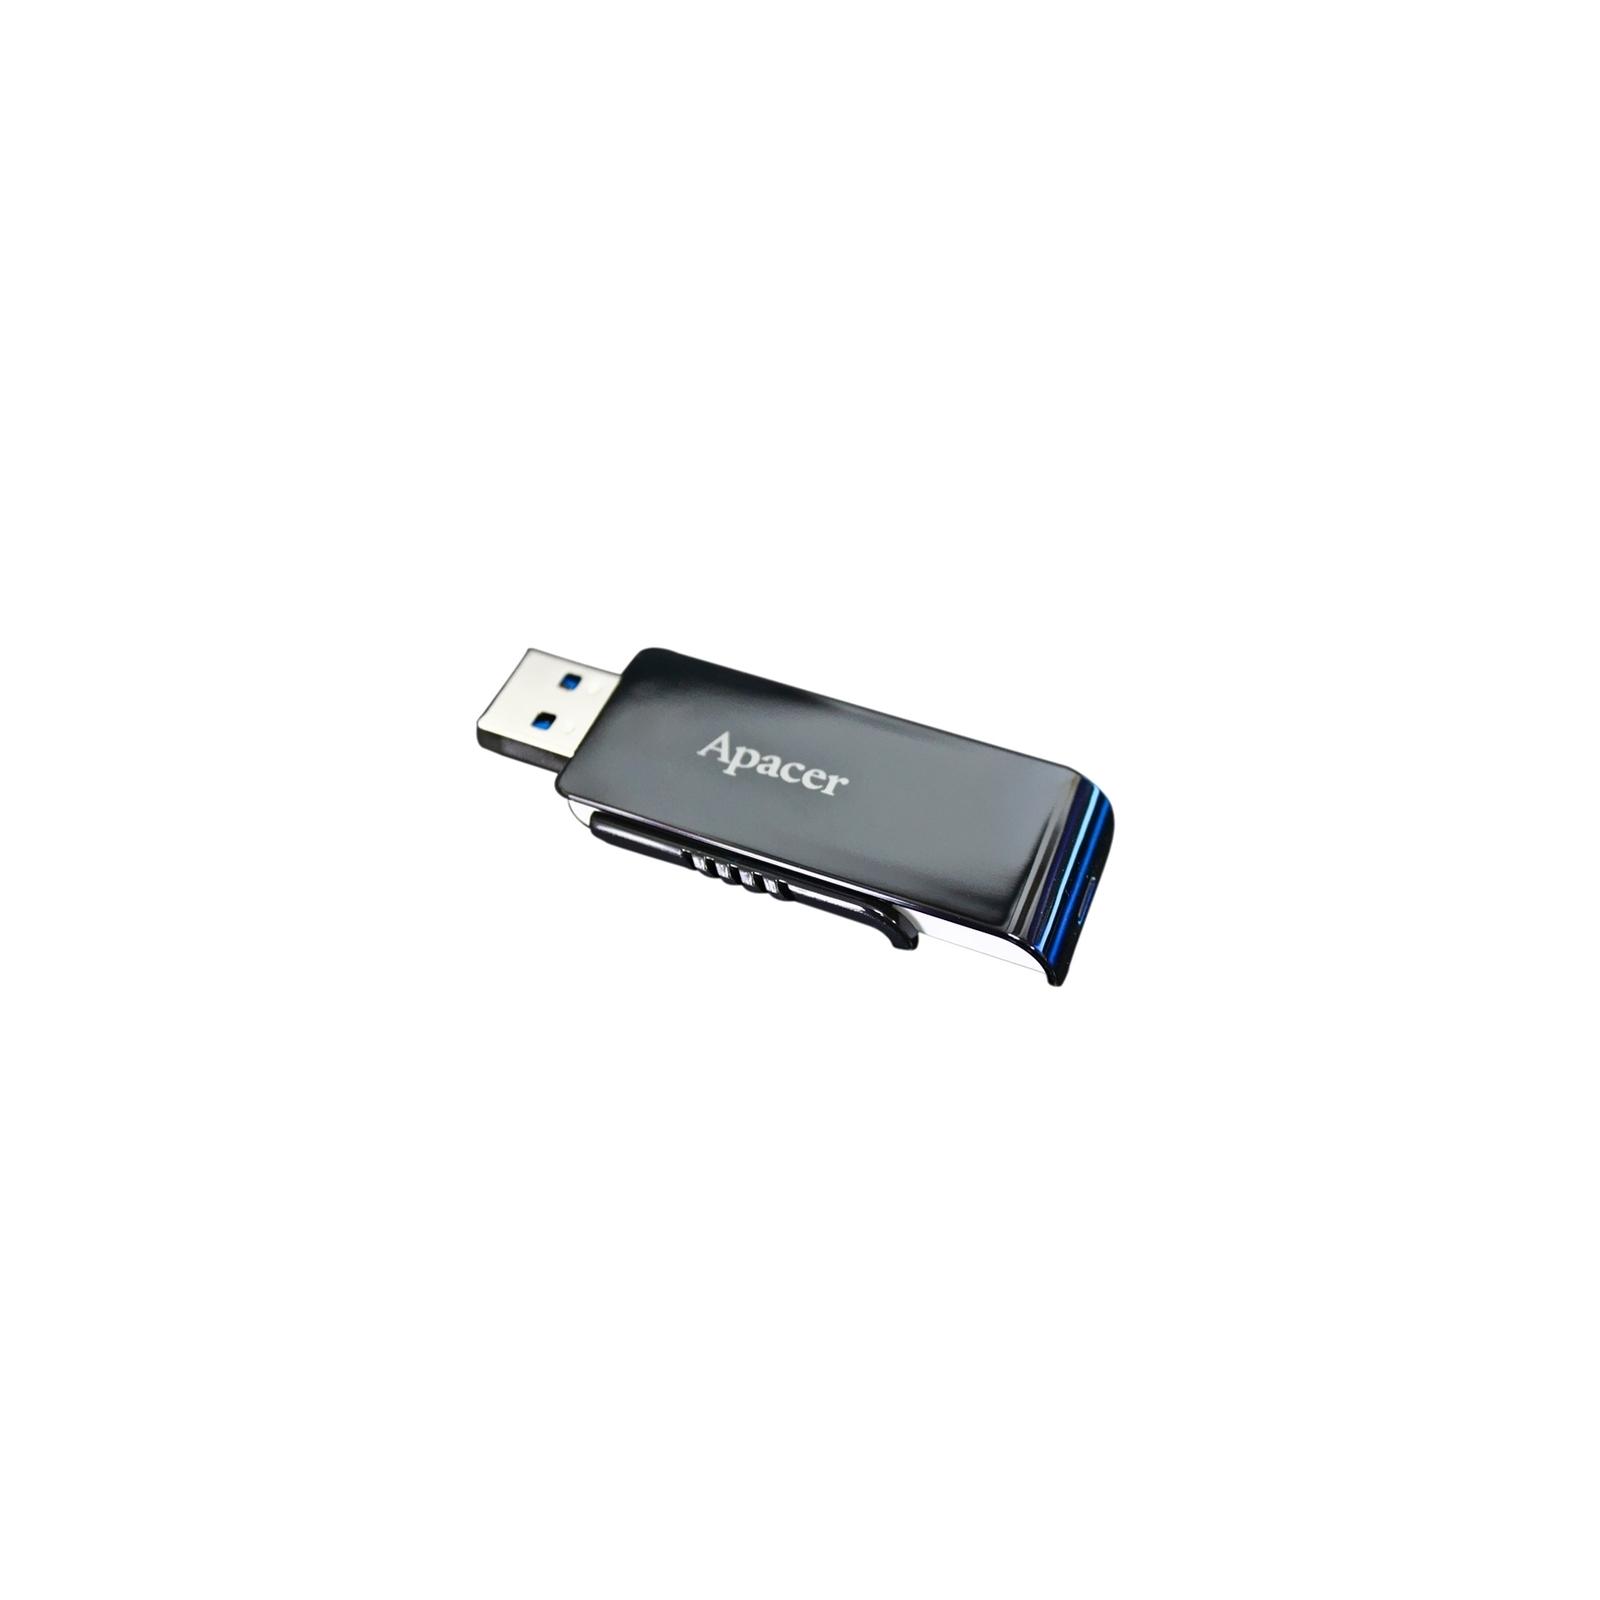 USB флеш накопитель 64GB AH350 Black RP USB3.0 Apacer (AP64GAH350B-1) изображение 9